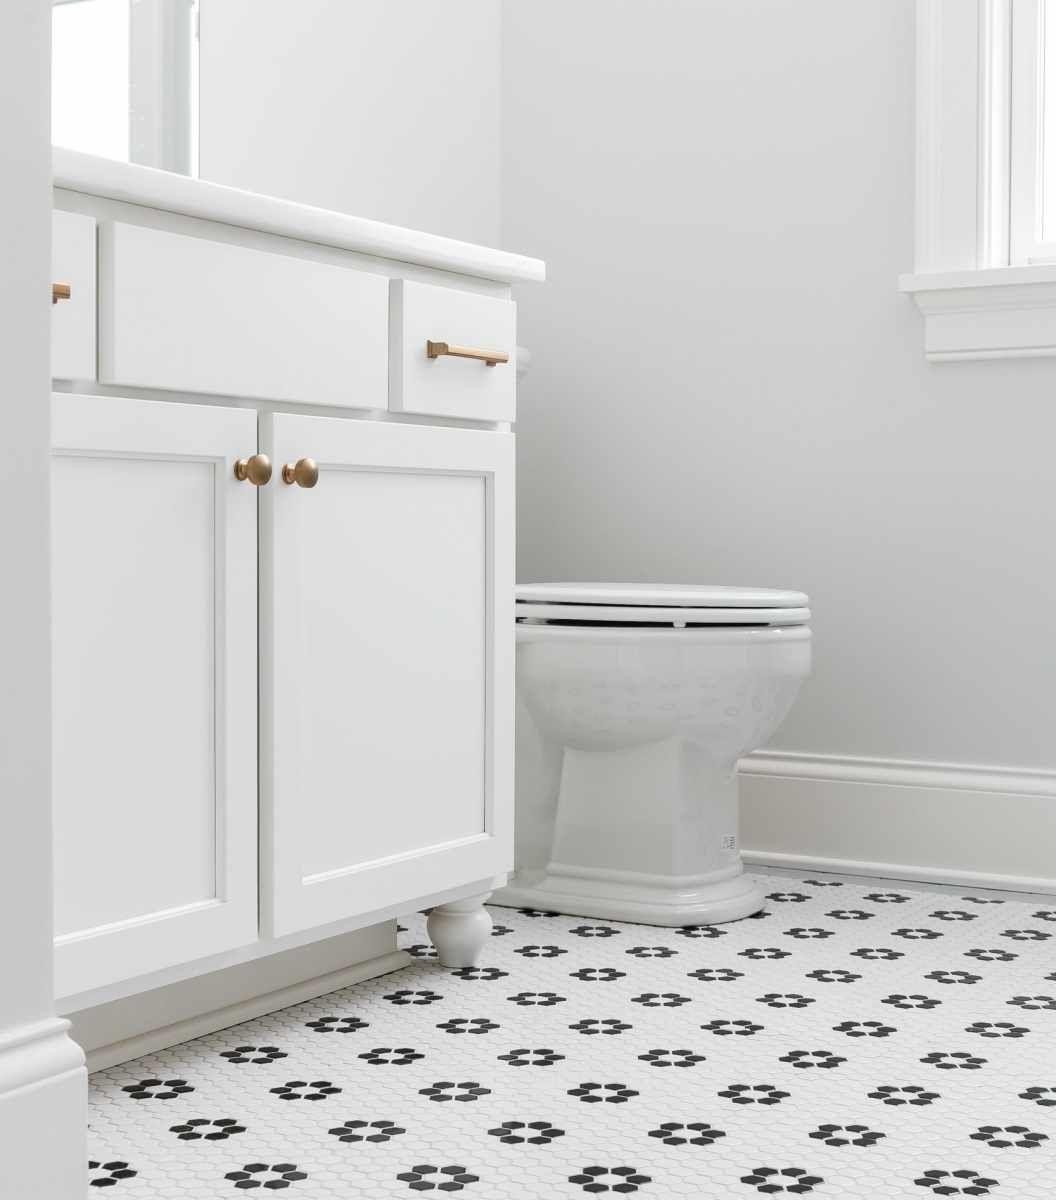 Glenview Park 7 Penny Tiles Bathroom Patterned Floor Tiles